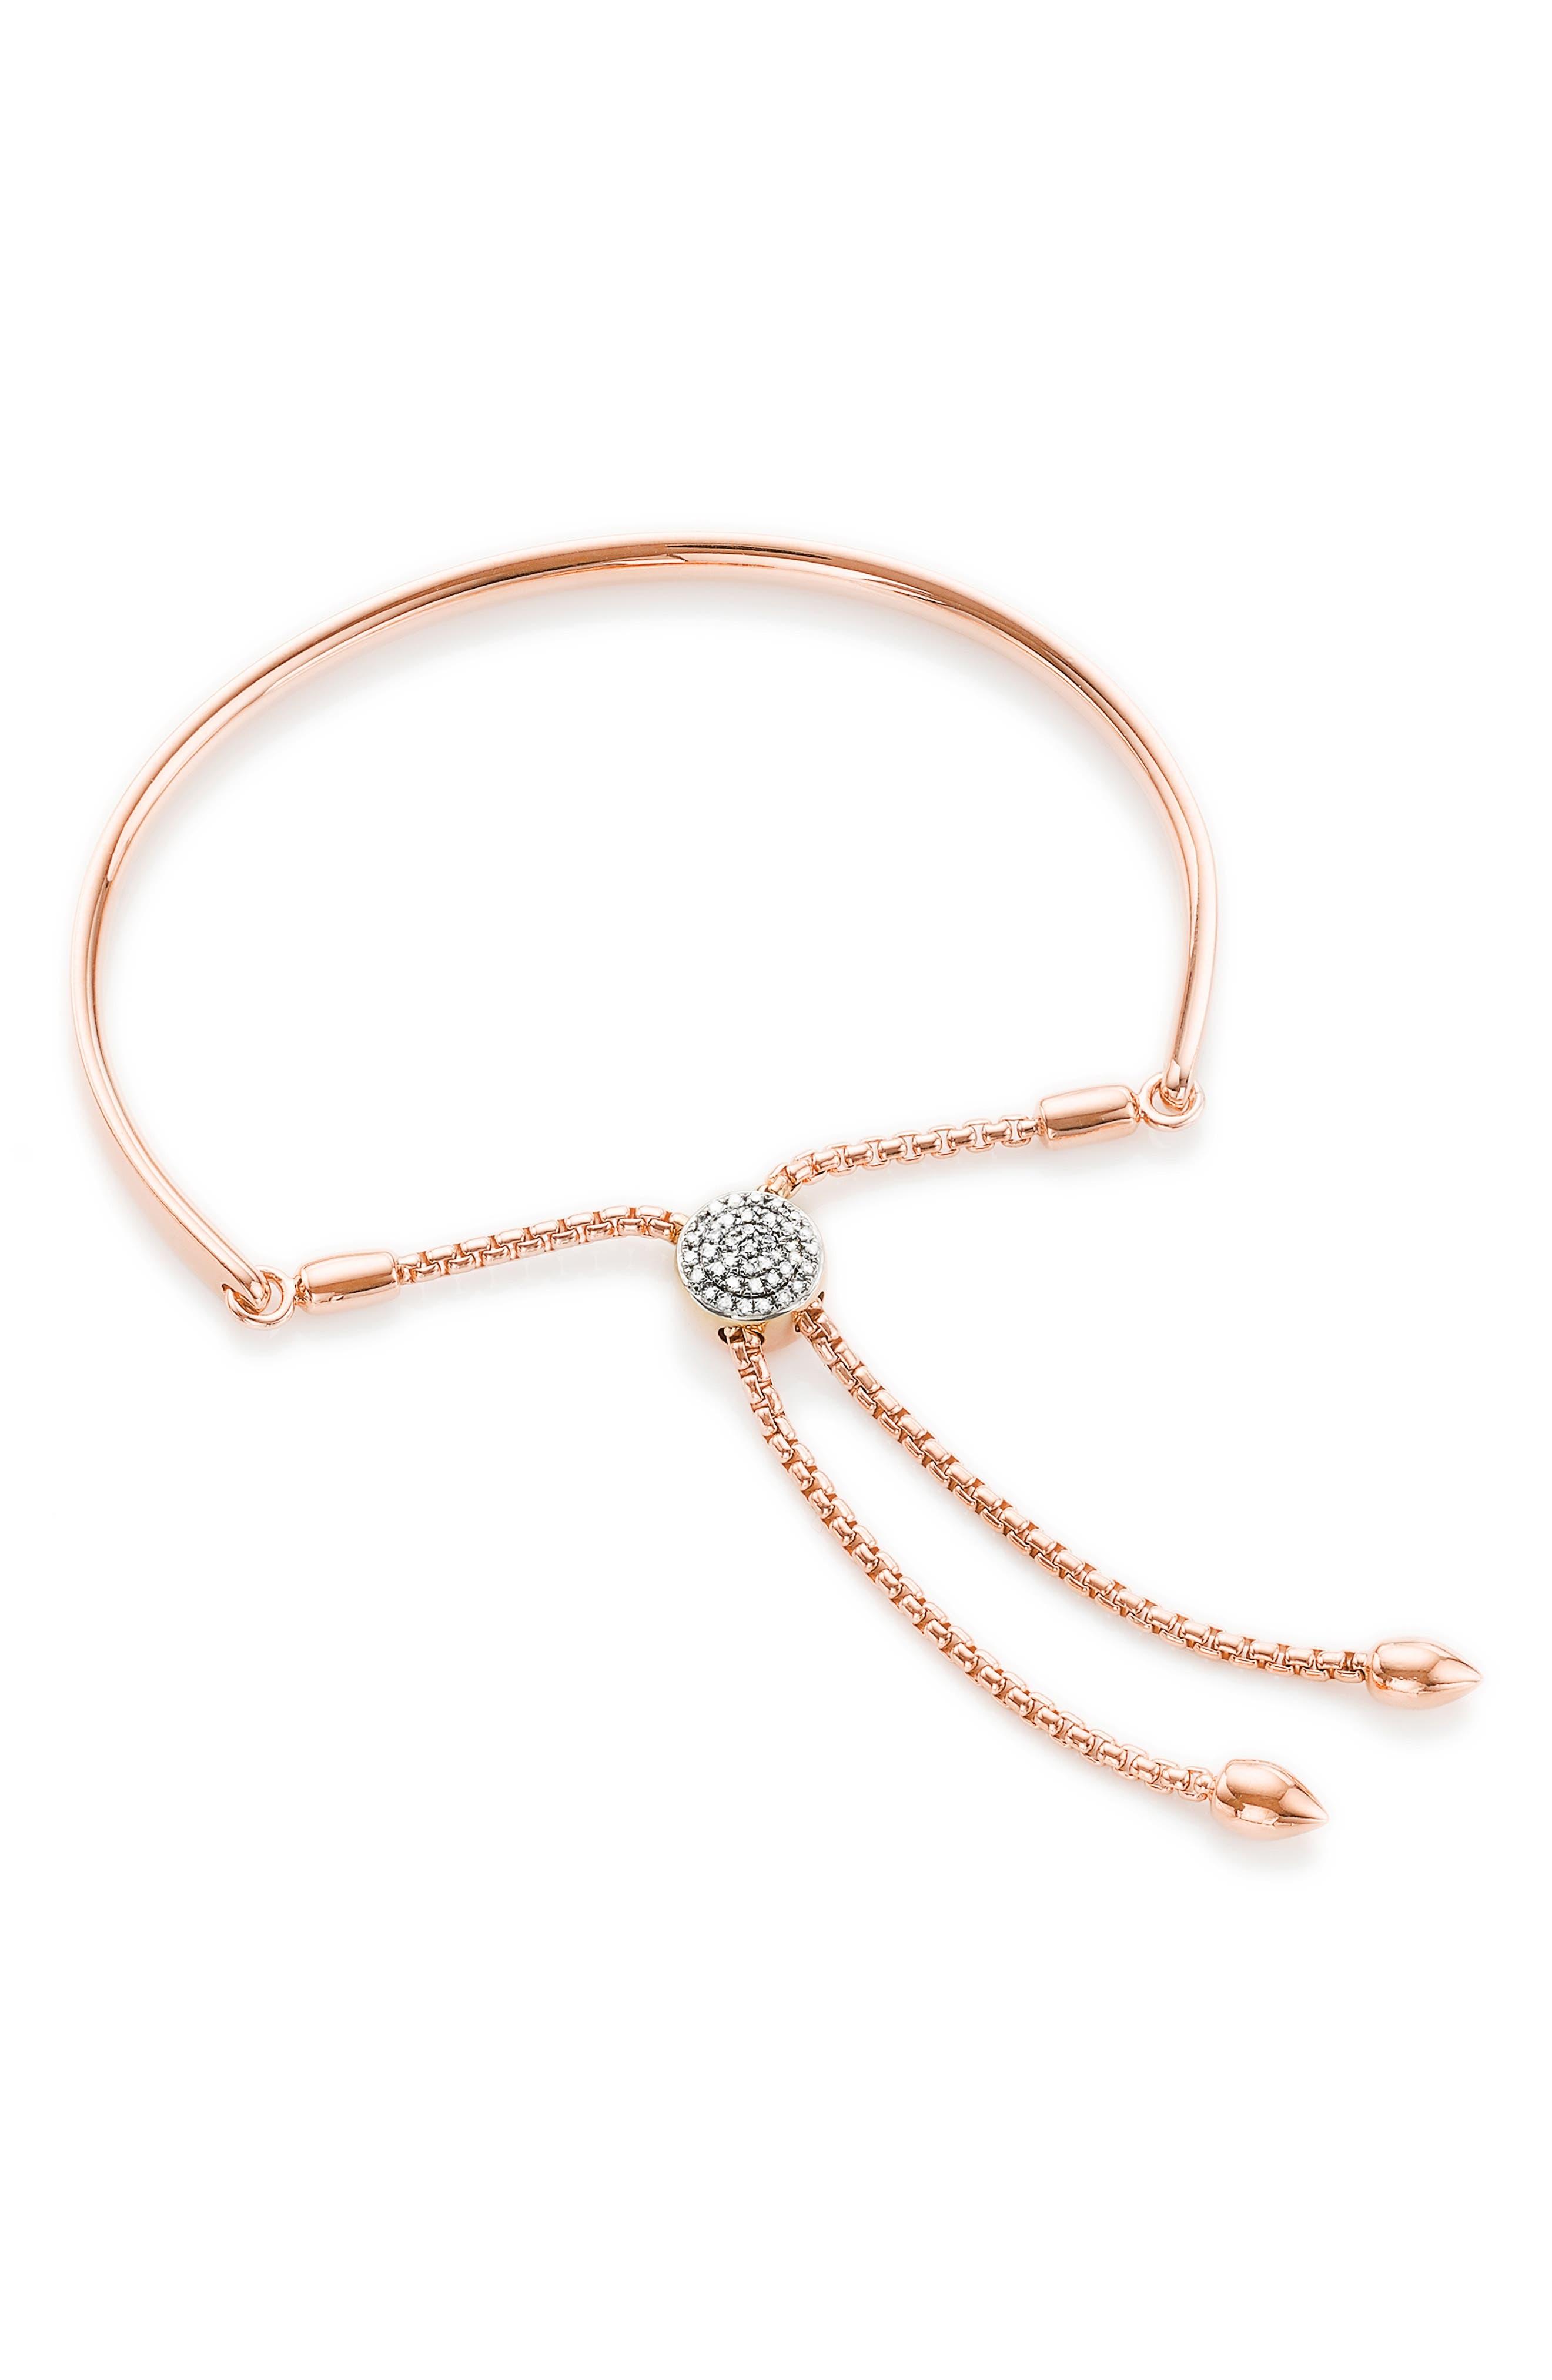 Monica Vinader Fiji Diamond Toggle Bracelet